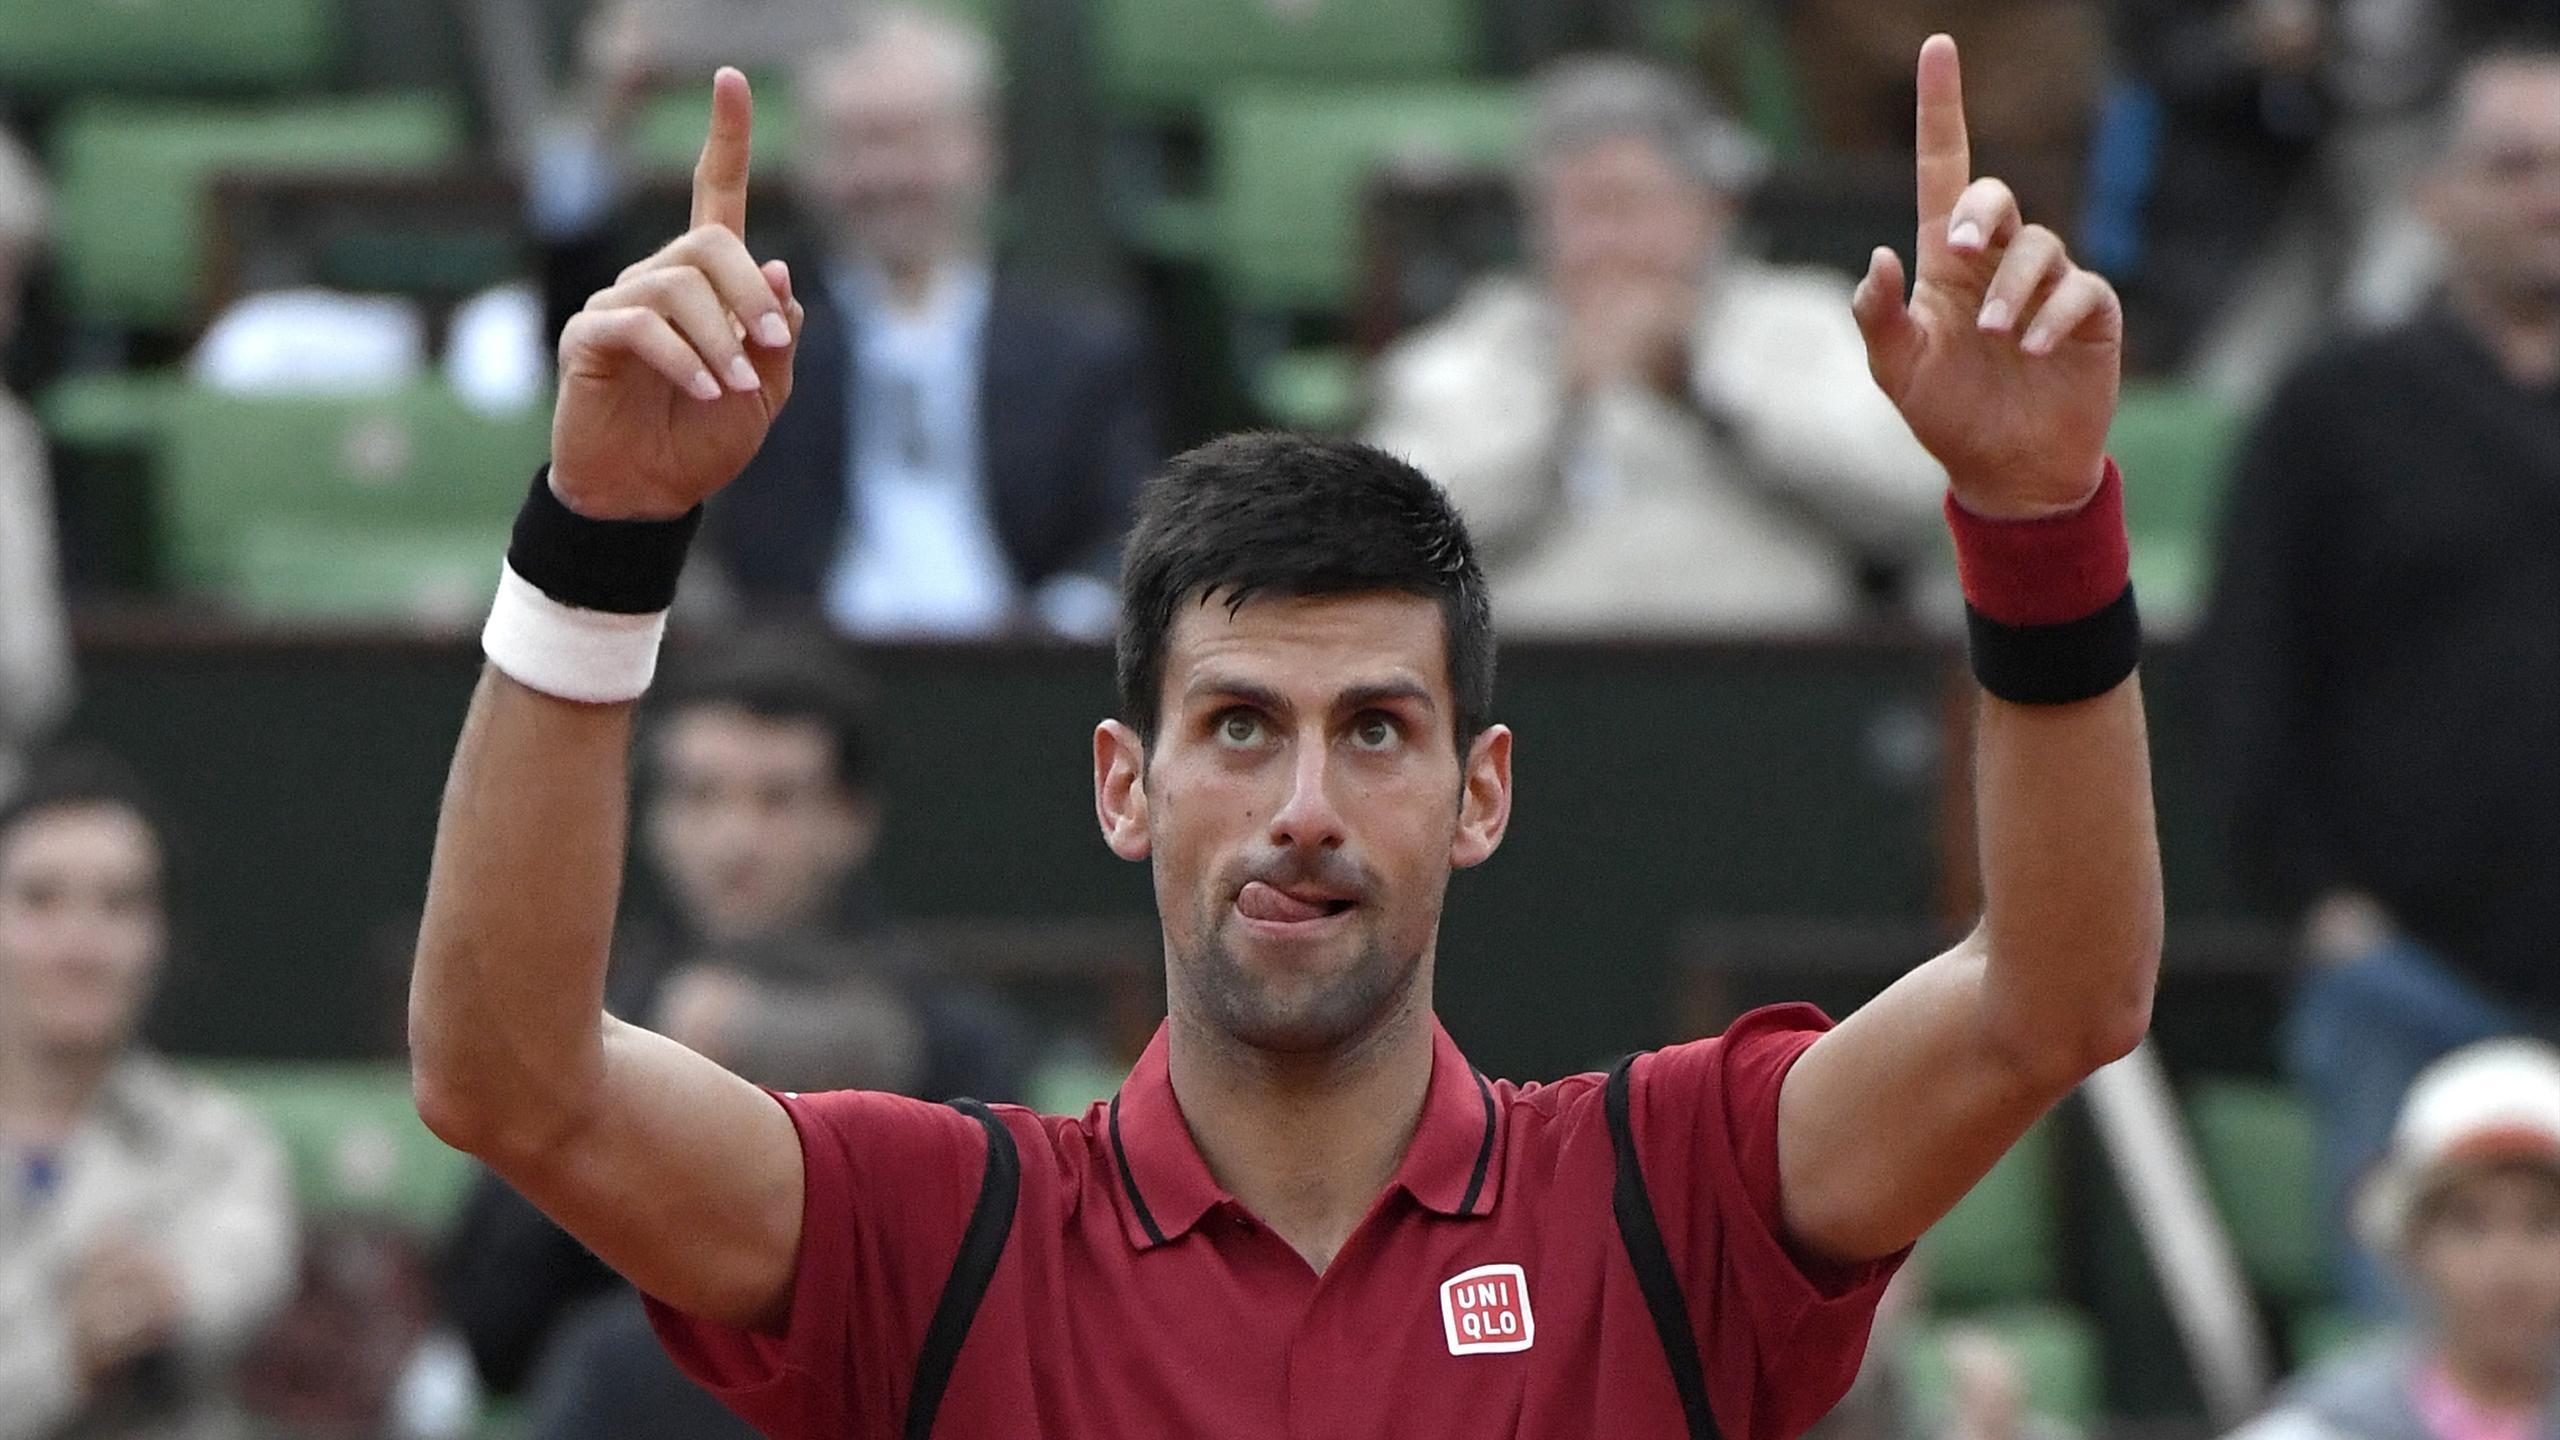 Novak Djokovic celebrates winning at Roland Garros